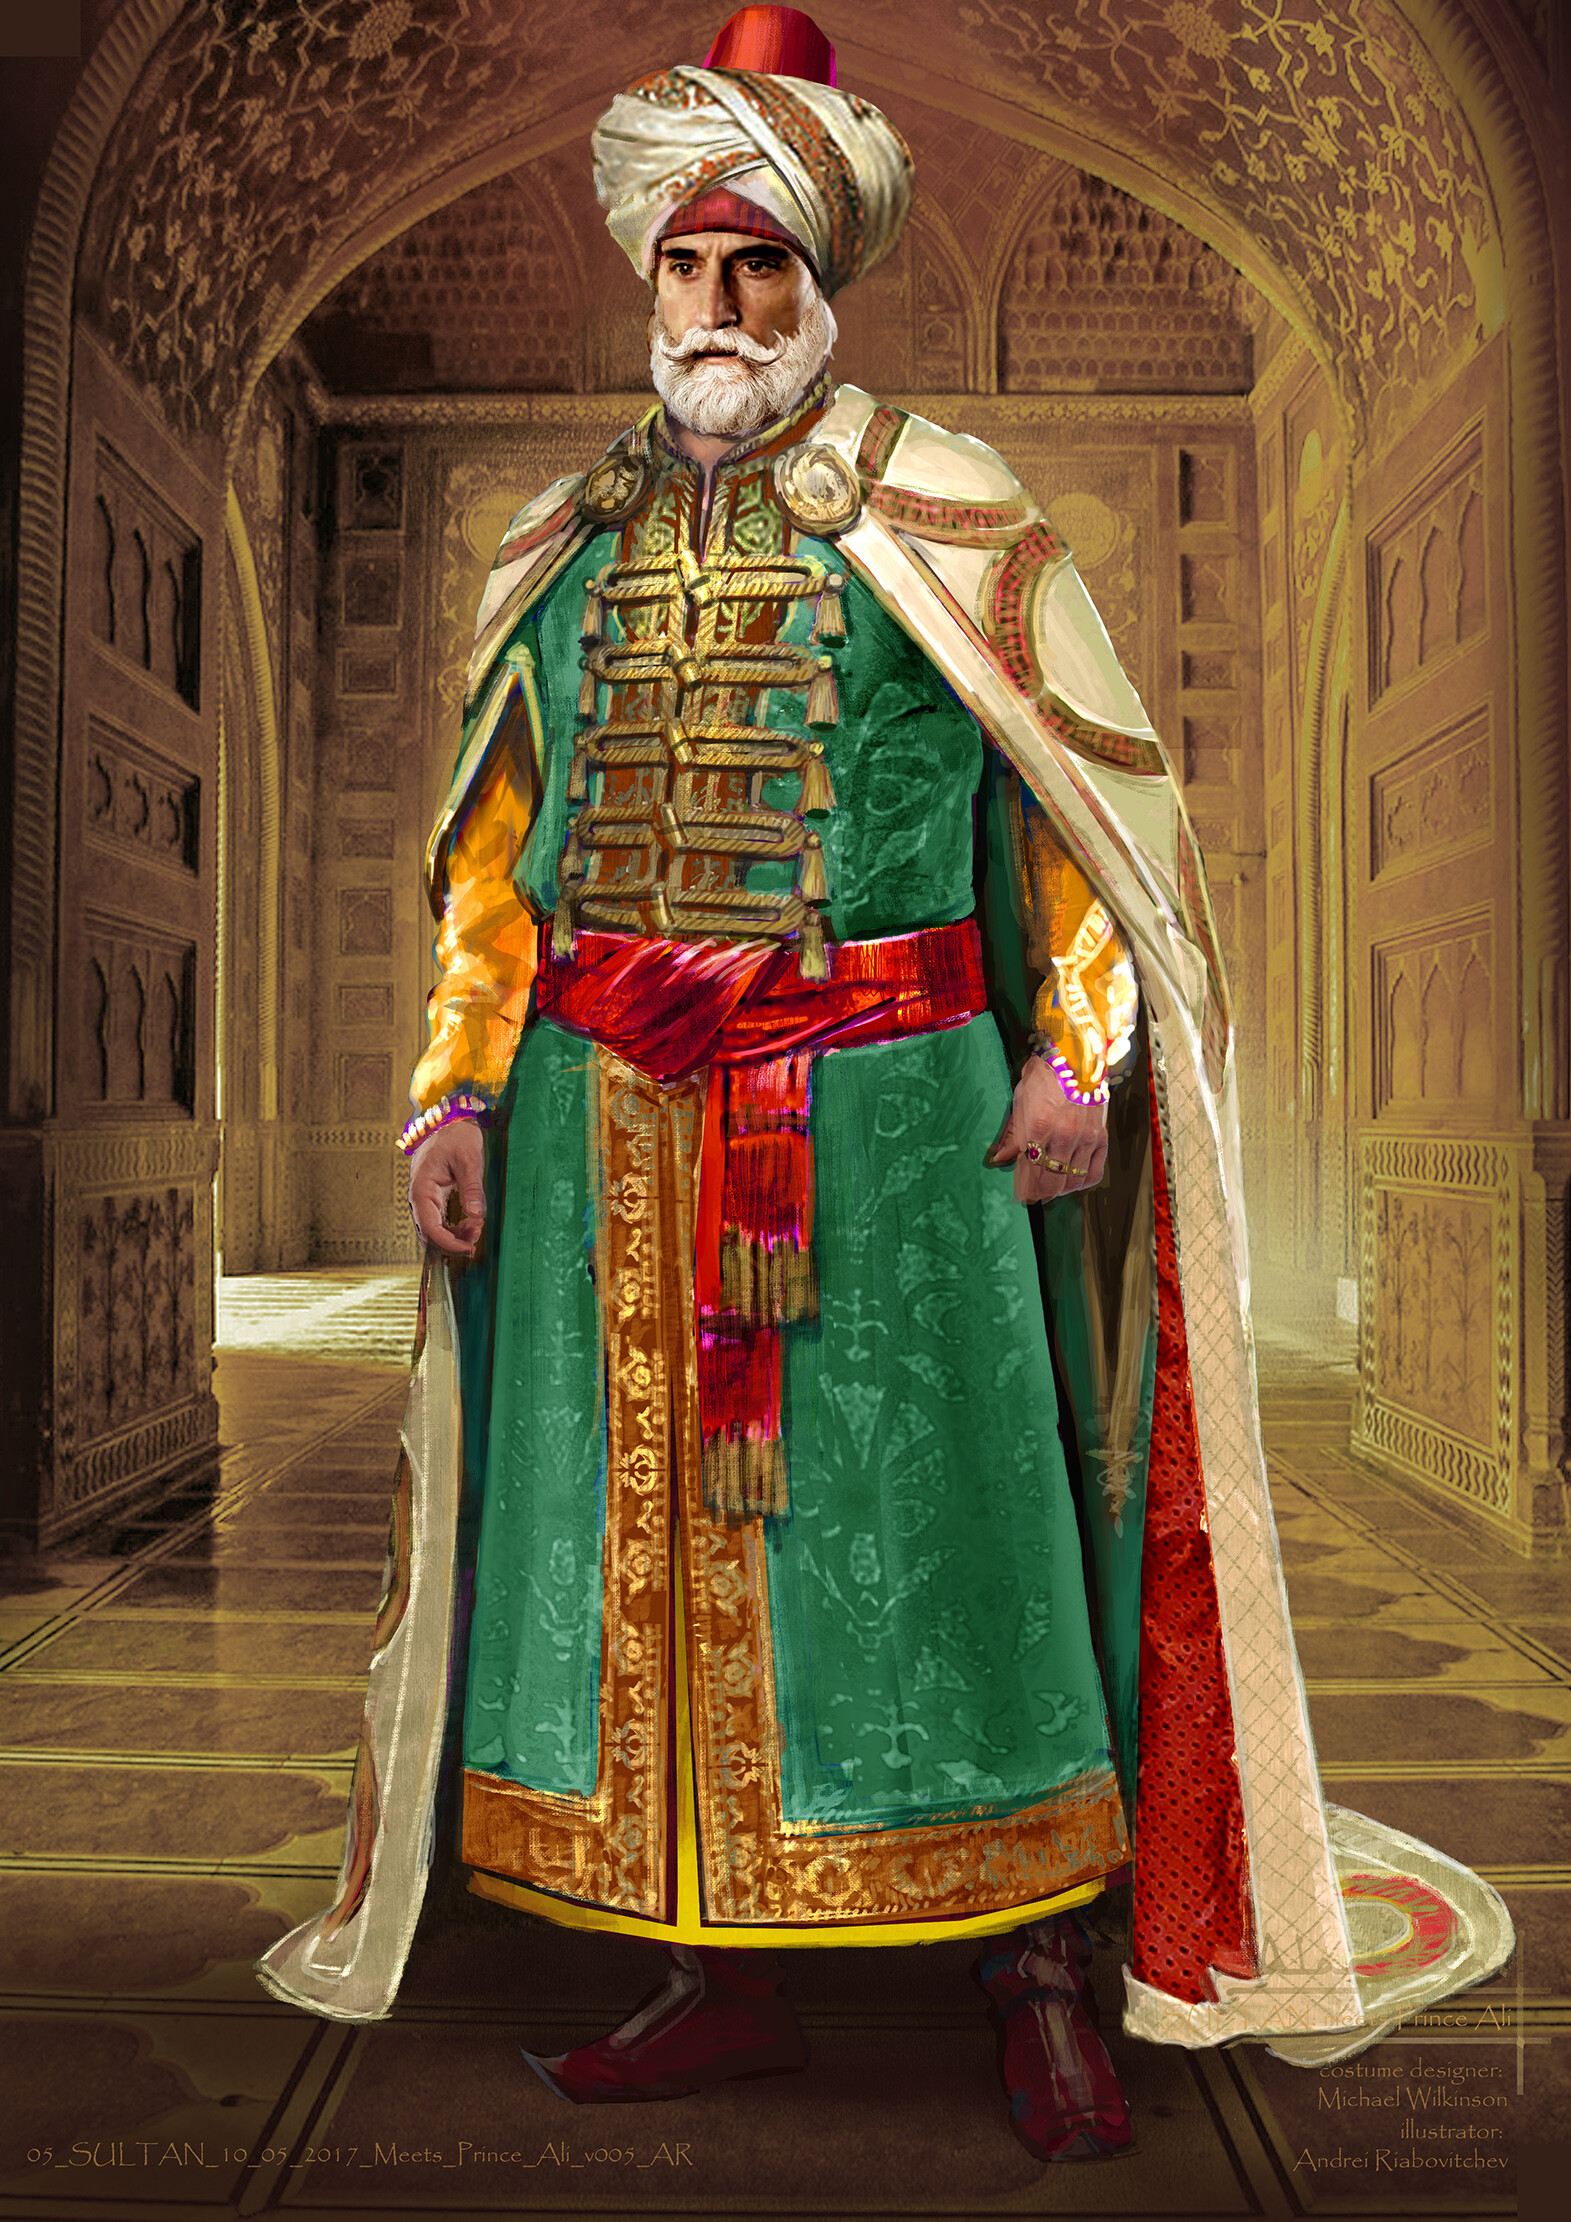 Aladdin [Disney - 2019] - Page 43 Andrei-riabovitchev-05-sultan-10-05-2017-meet-prince-ali-v005-ar